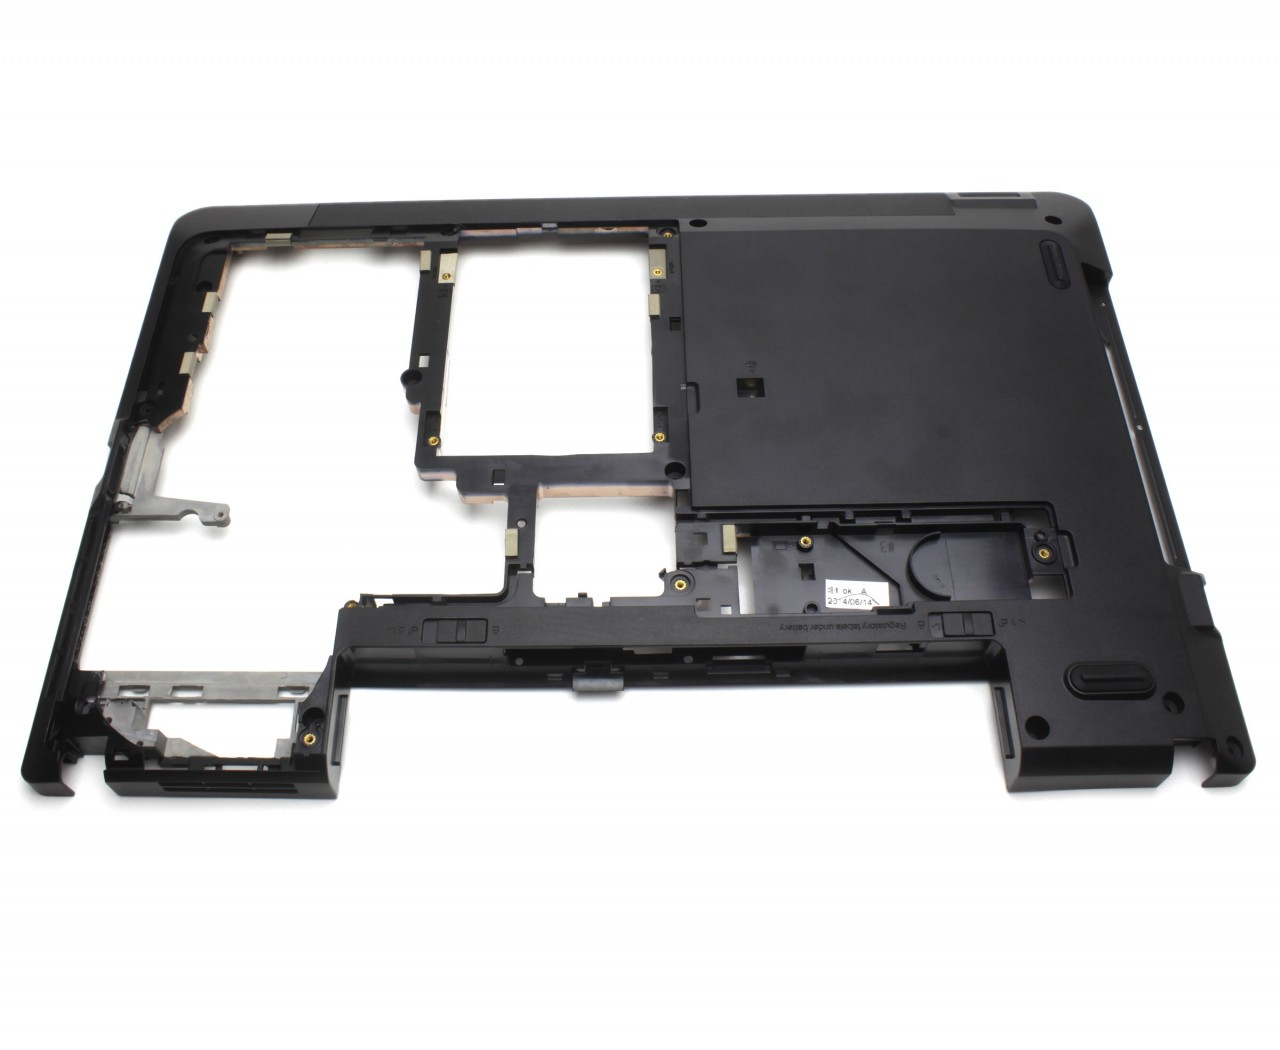 Bottom Case Lenovo ThinkPad AP0SK00500SLH10C46J301AD43 Carcasa Inferioara Neagra imagine powerlaptop.ro 2021